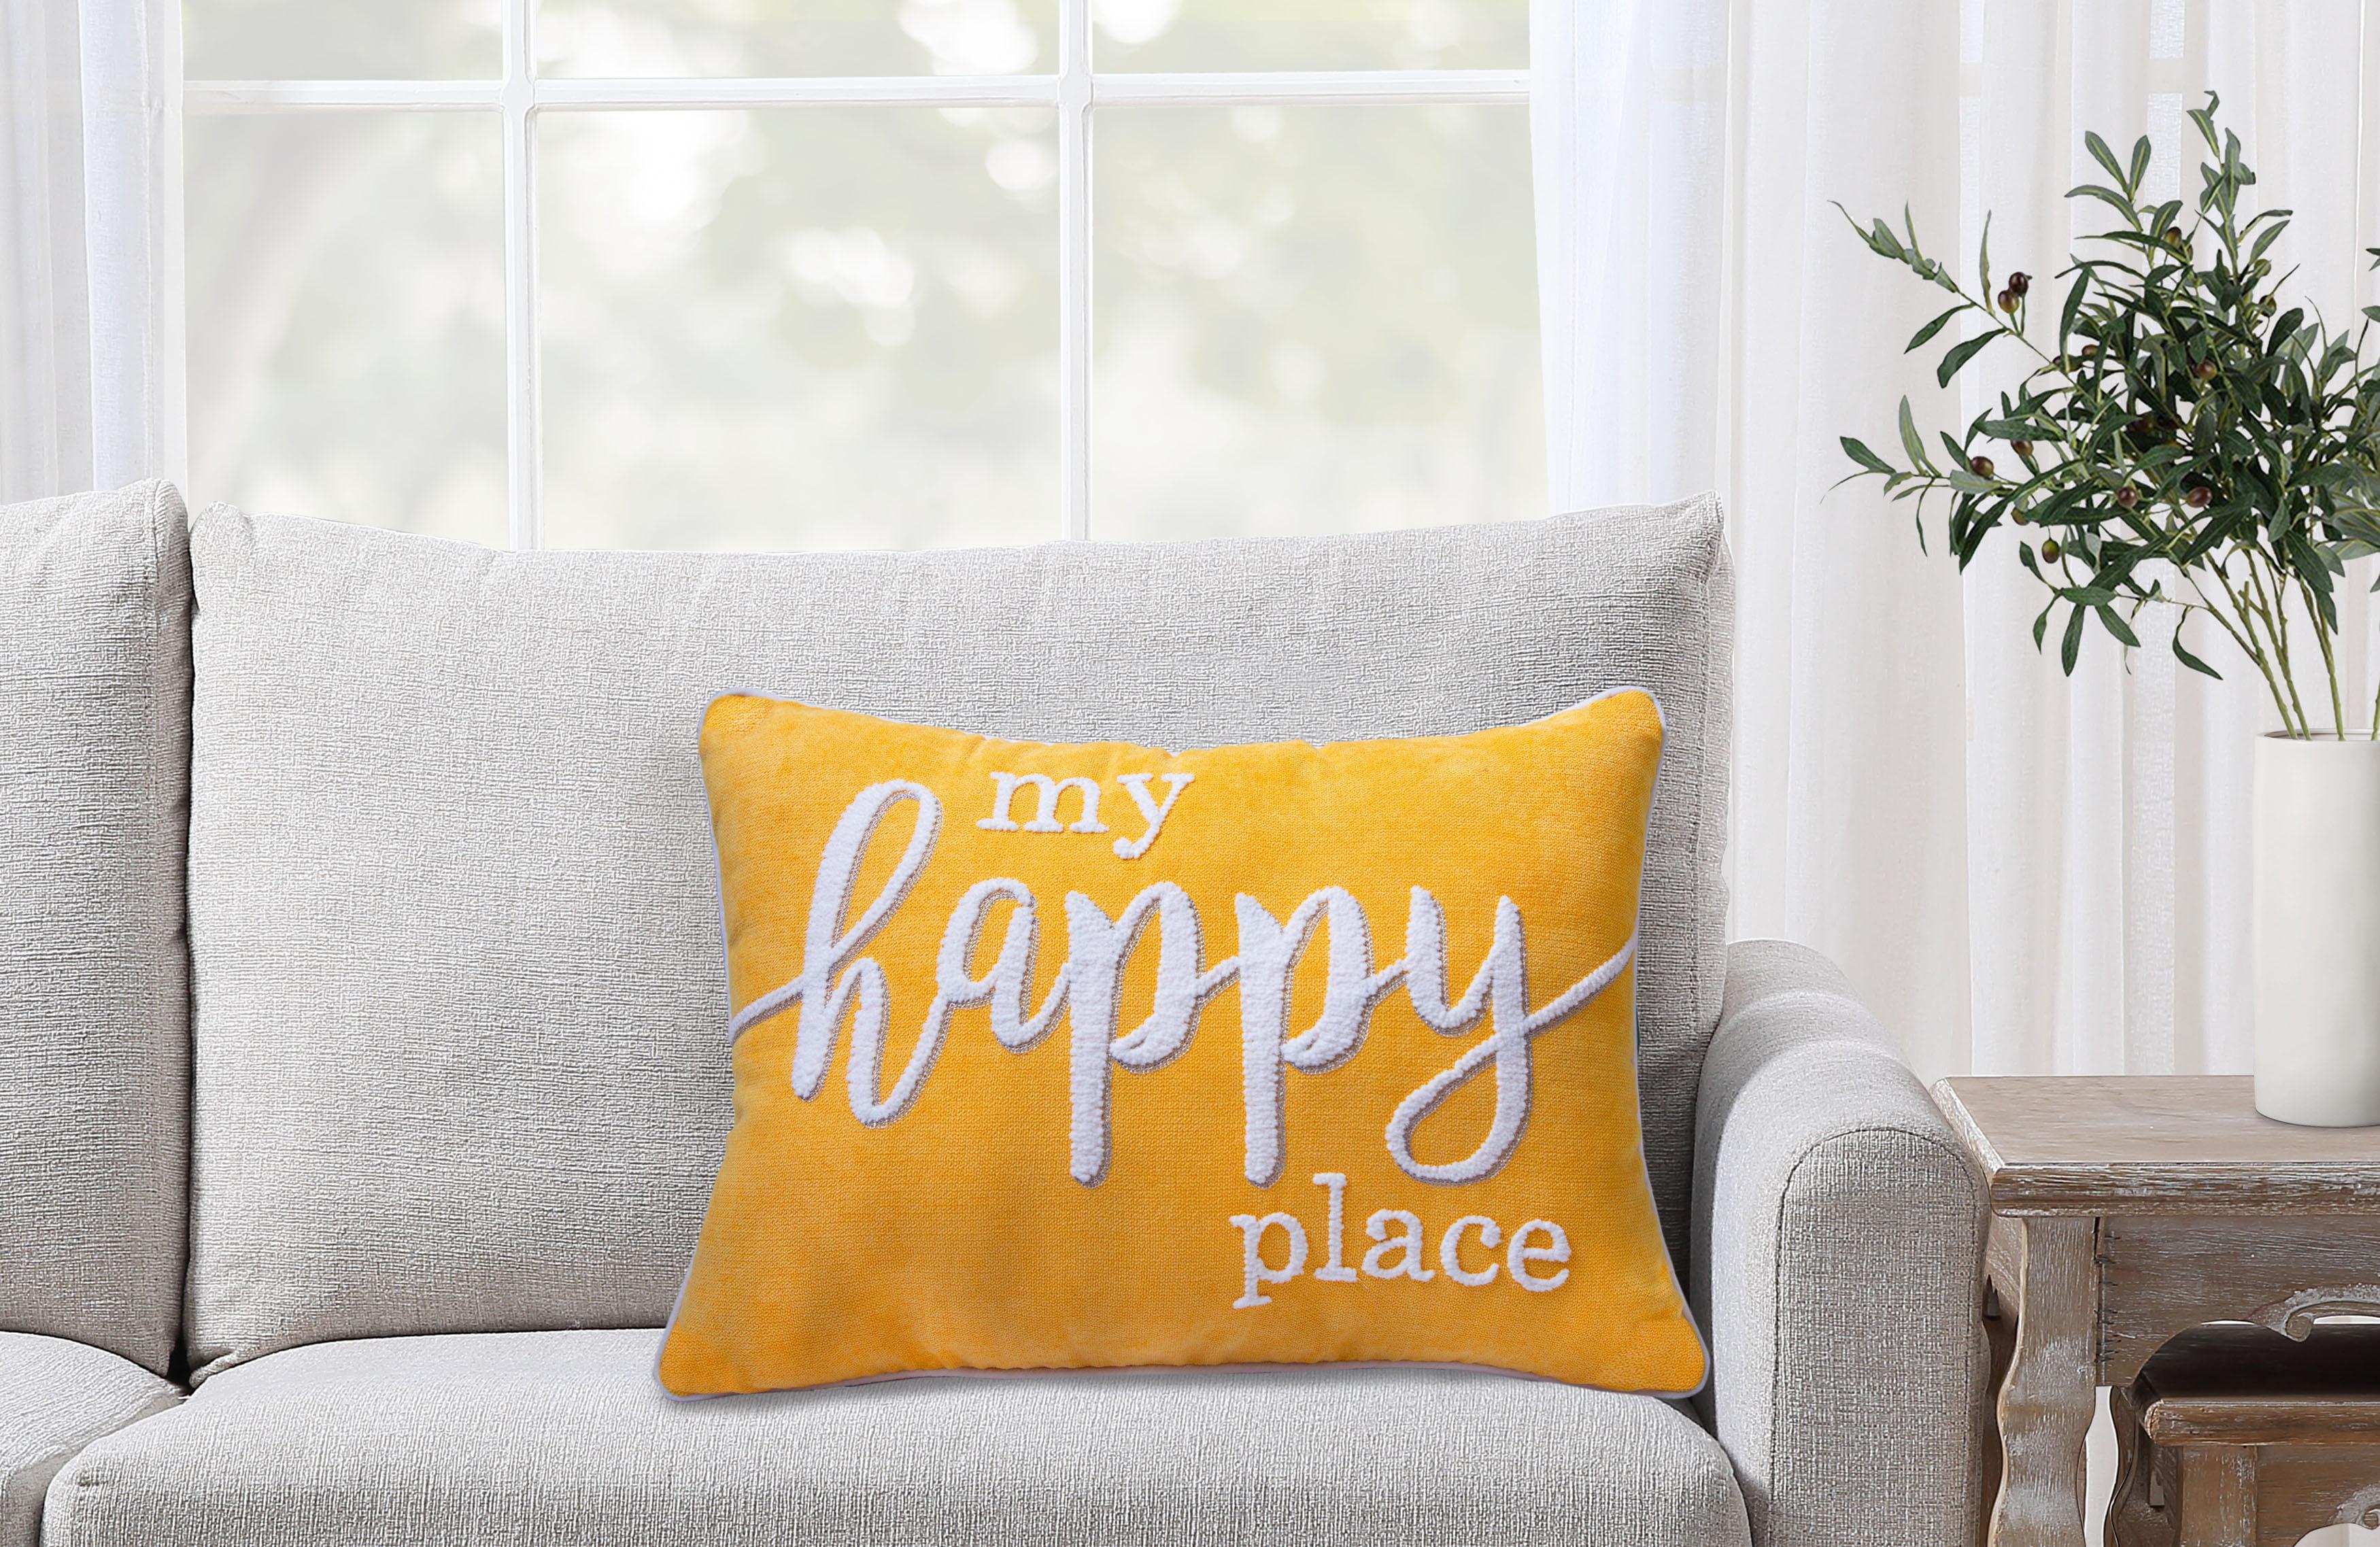 Better Homes Gardens Decorative Throw Pillow My Happy Place Oblong Yellow 14 X 20 1pack Walmart Com Walmart Com